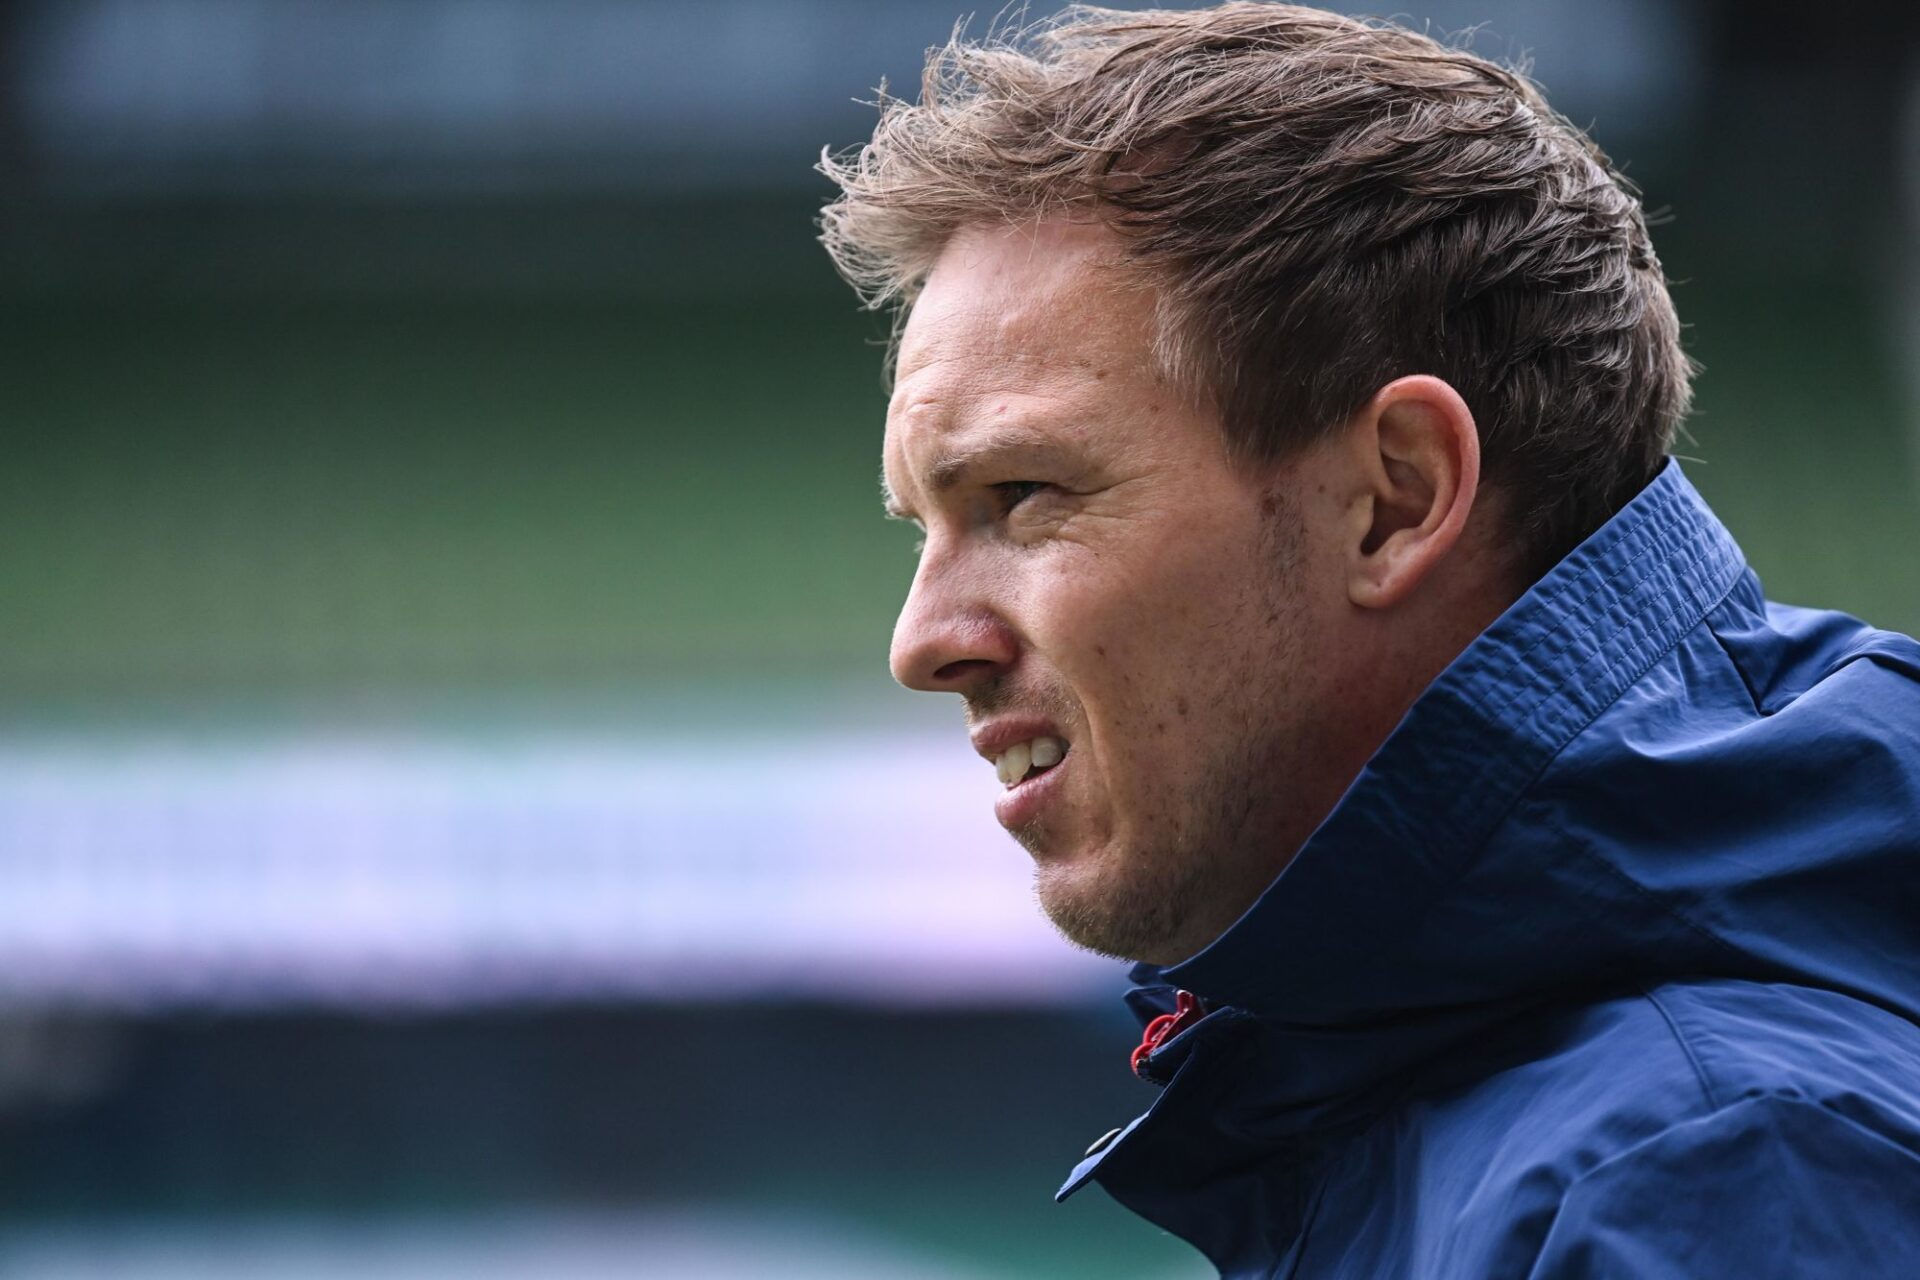 Julian Nagelsmann sera le futur entraîneur du Bayern la saison prochaine. Icon Sport